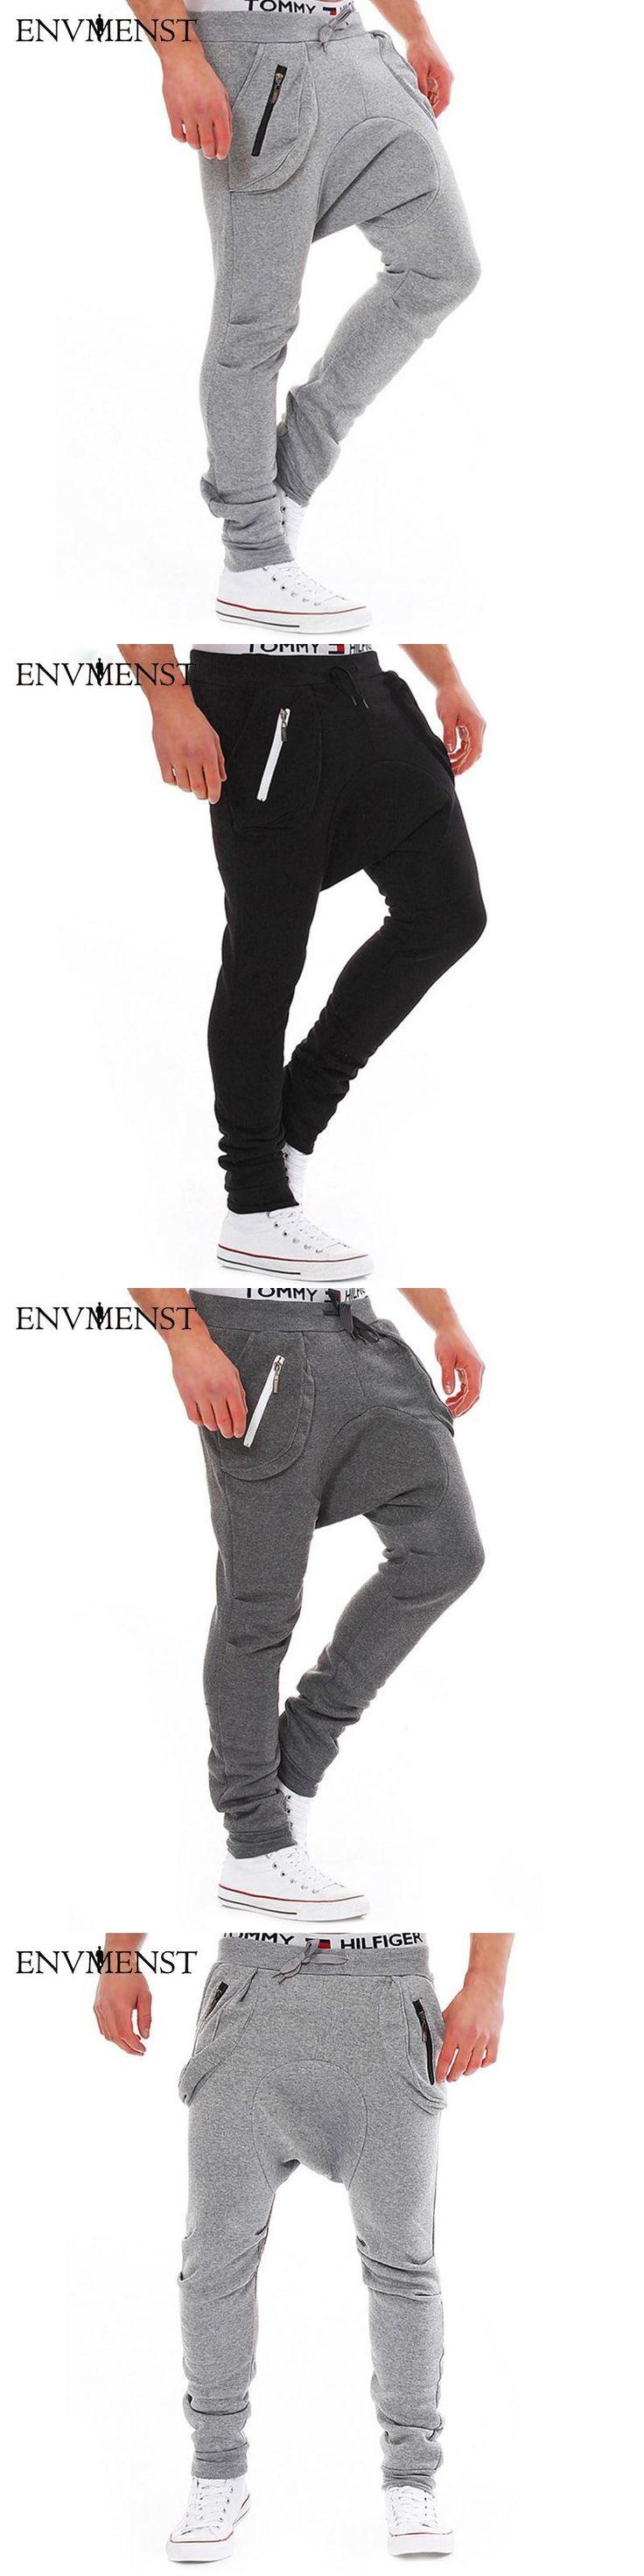 2017 New Fashion Men's Jogger Pants Men Loose Hip Hop Harem Joggers Cotton Solid Comfort Casual acting Sweatpants Trousers